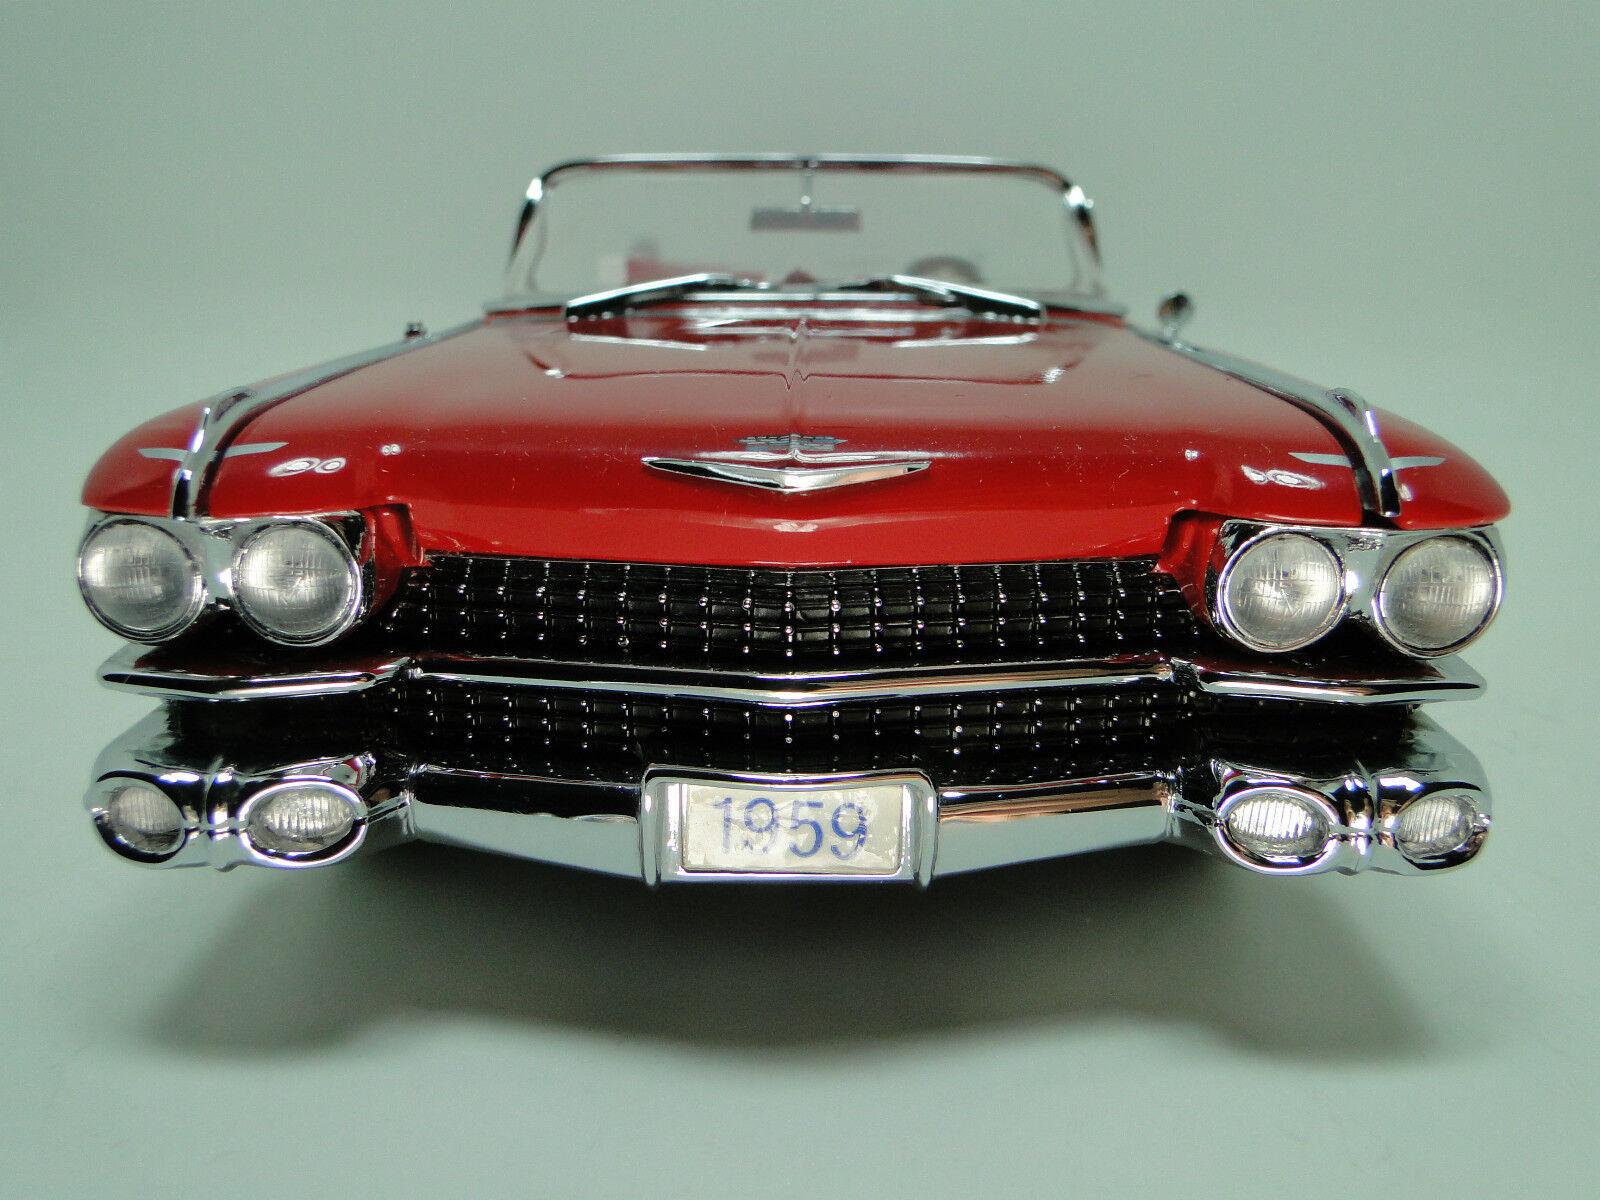 Cadillac Eldorado construido 1959 1 Vintage Sport Coche 24 concepto 12 Promo 25 1967